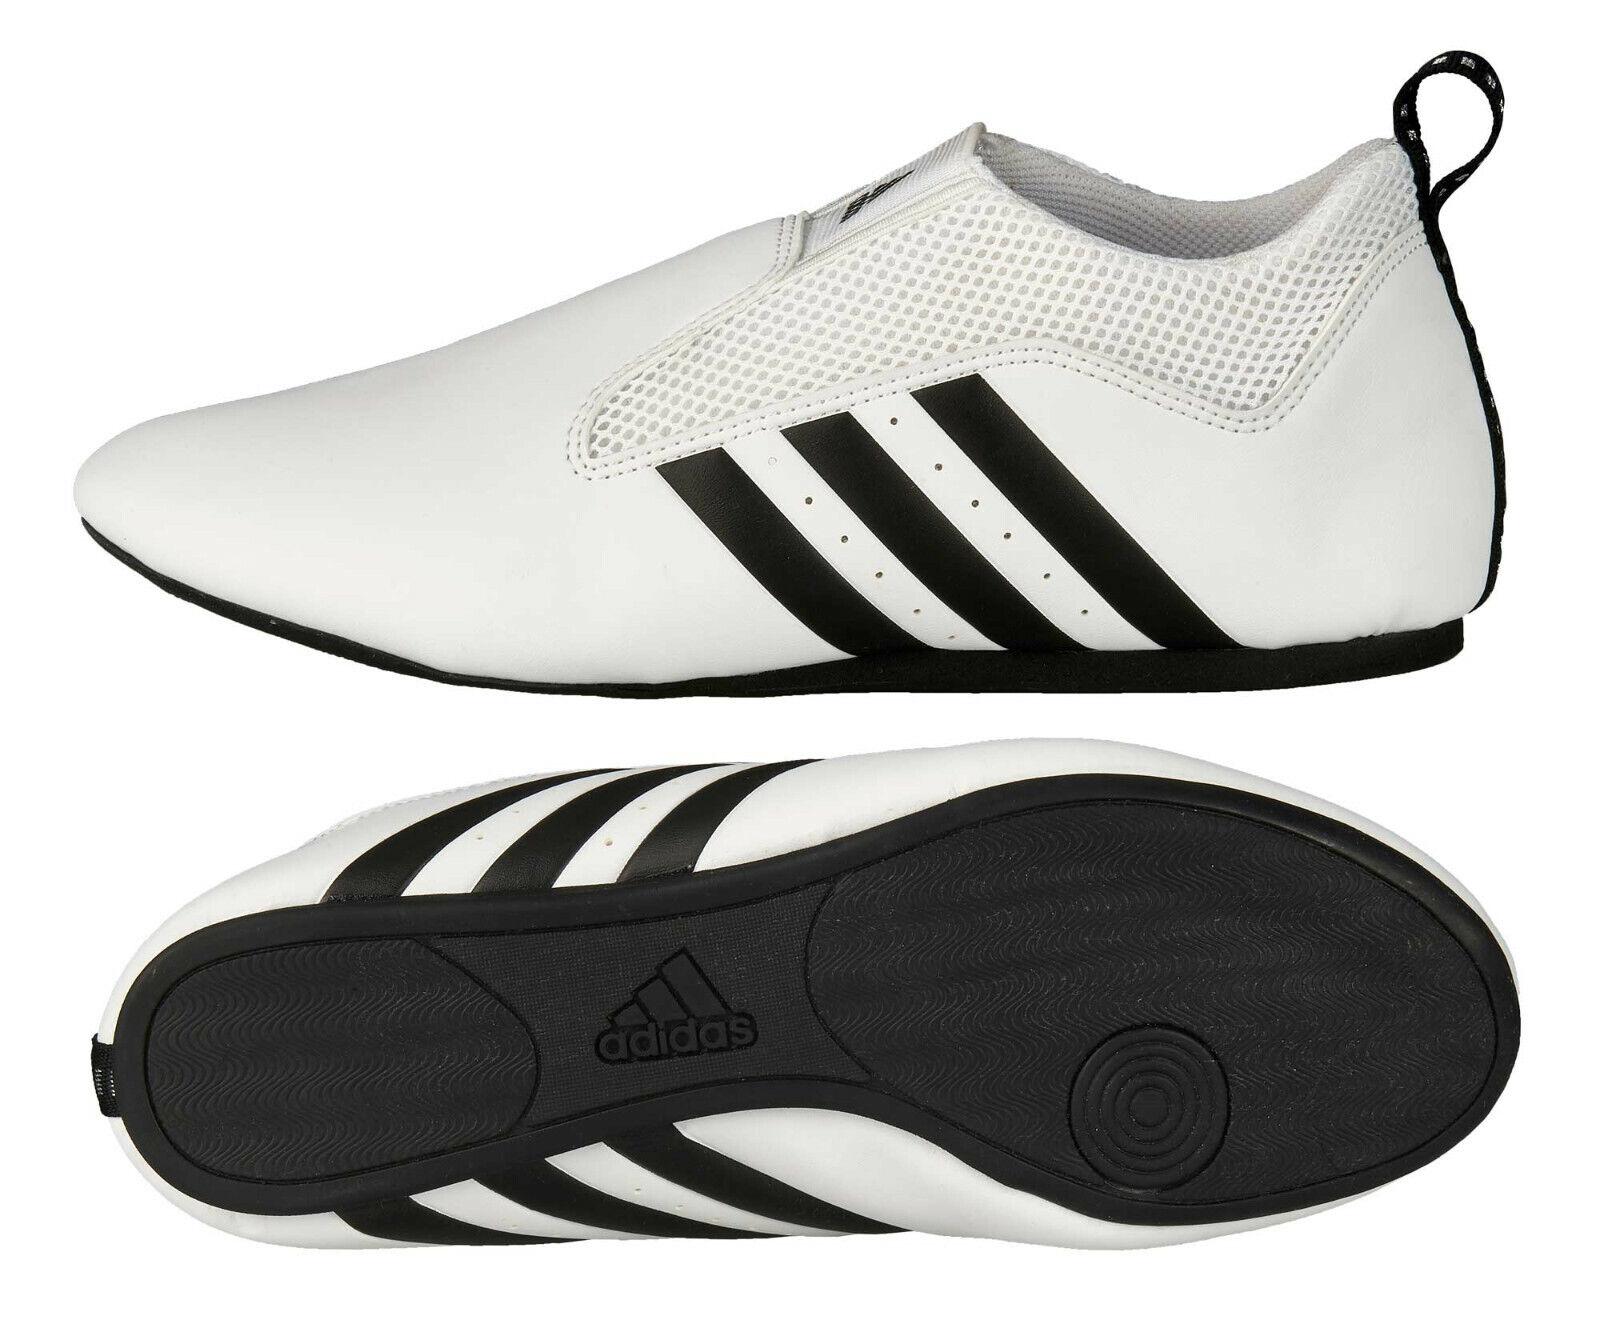 Factory Outlets Adidas Contestant Pro Hallensport und